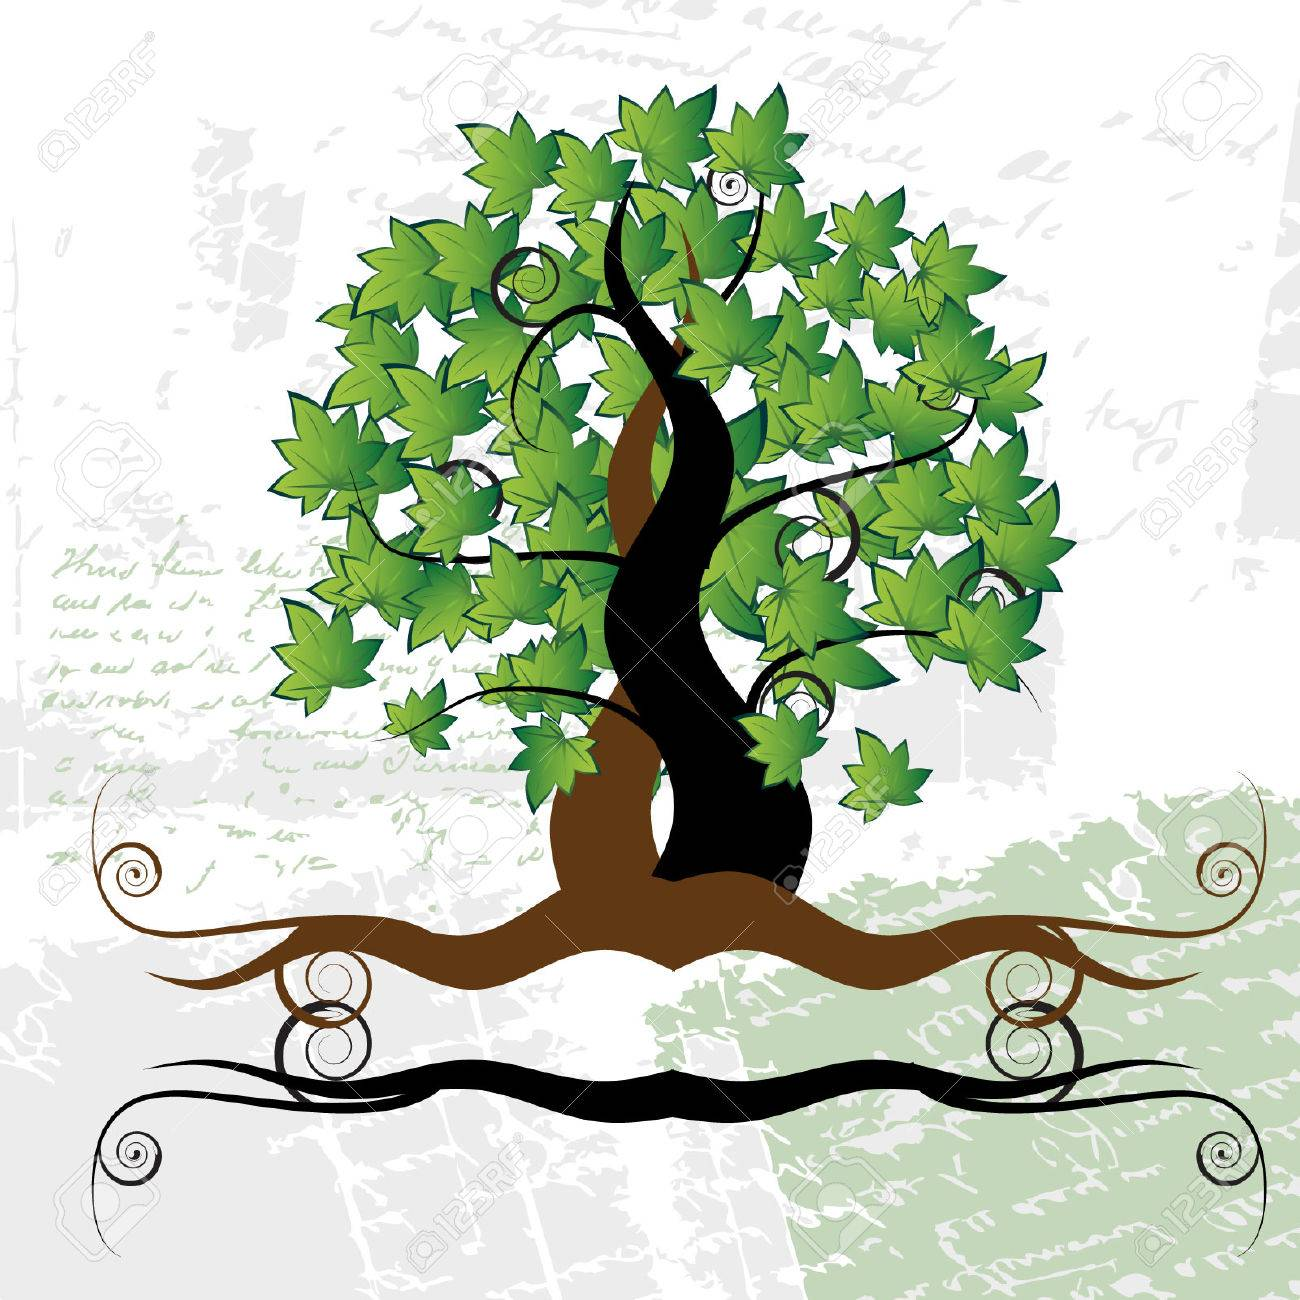 Old tree, grass, summer, grunge background Stock Vector - 3093040